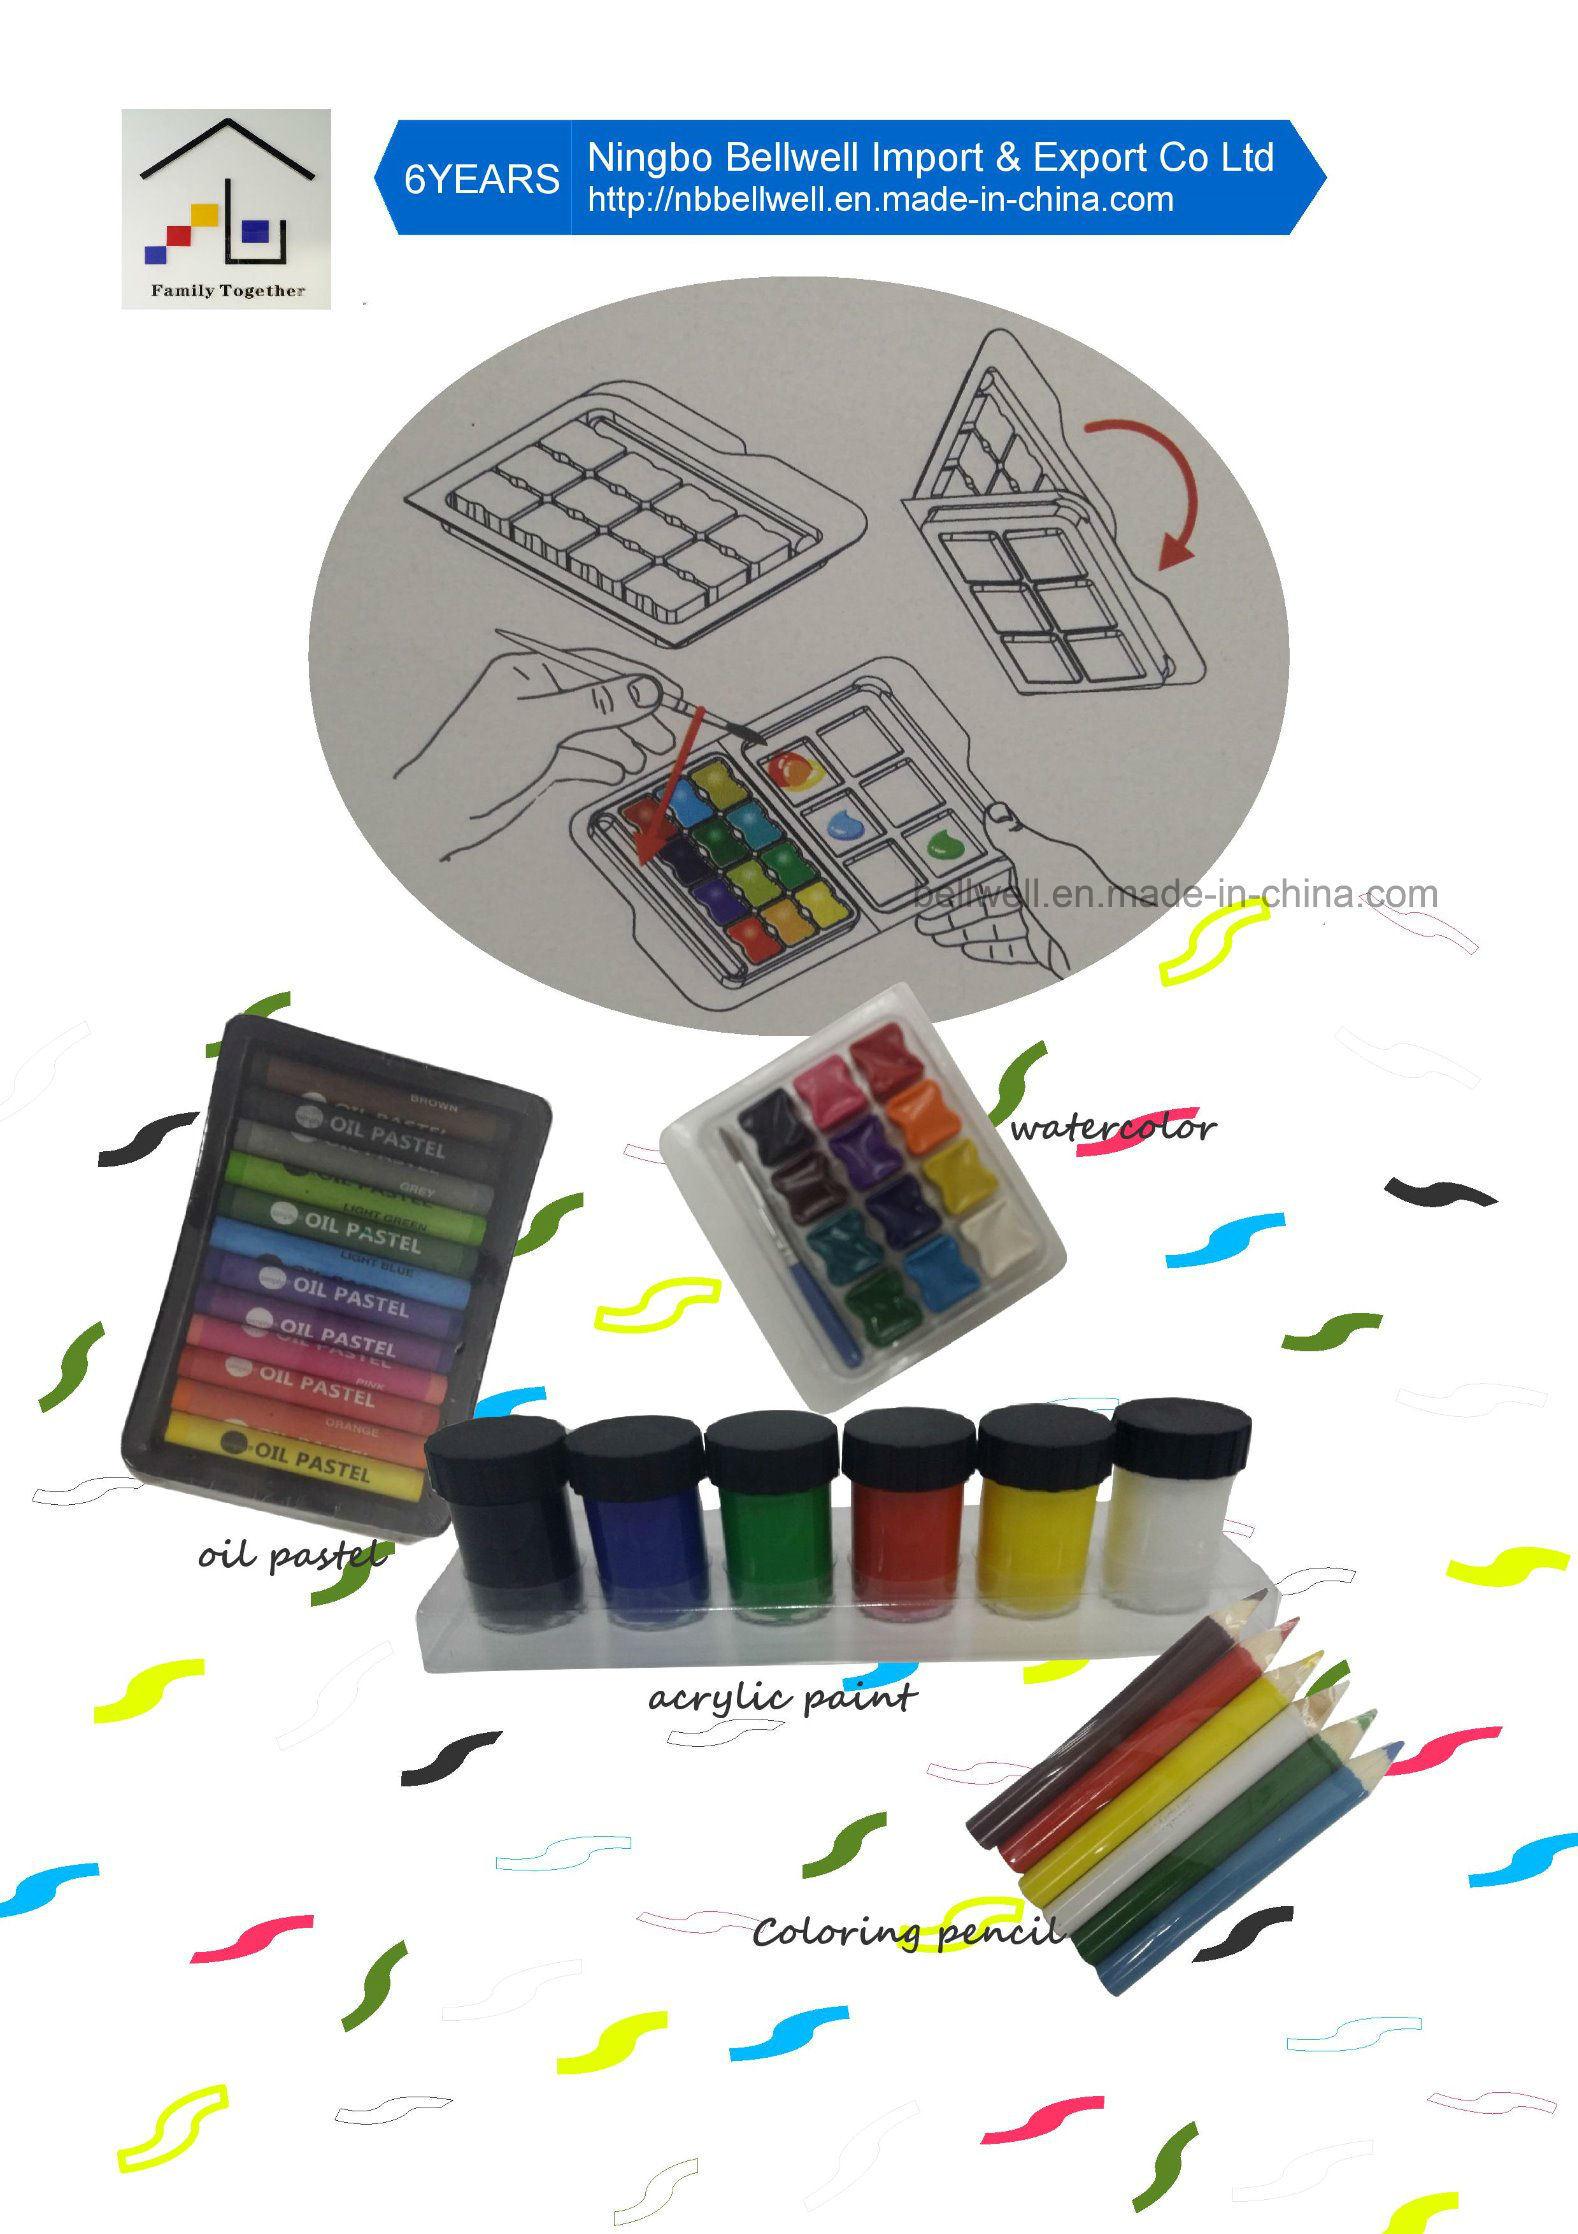 Stationery Set 53 PCS Art Set Watercolor Brush Set